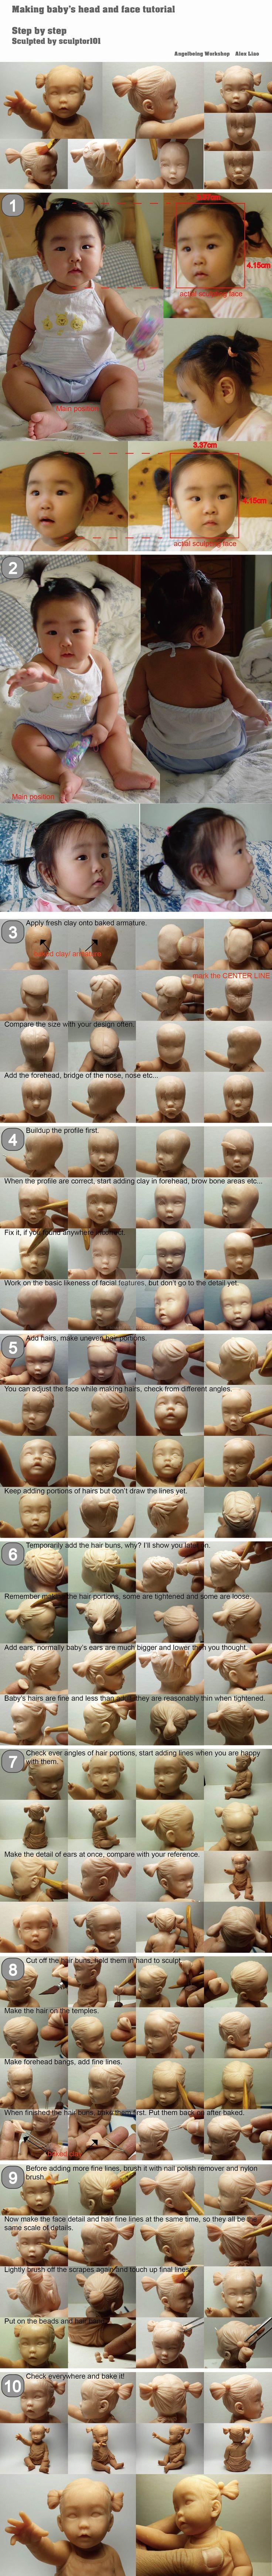 Making baby head and face tutorial by sculptor101.deviantart.com on @DeviantArt